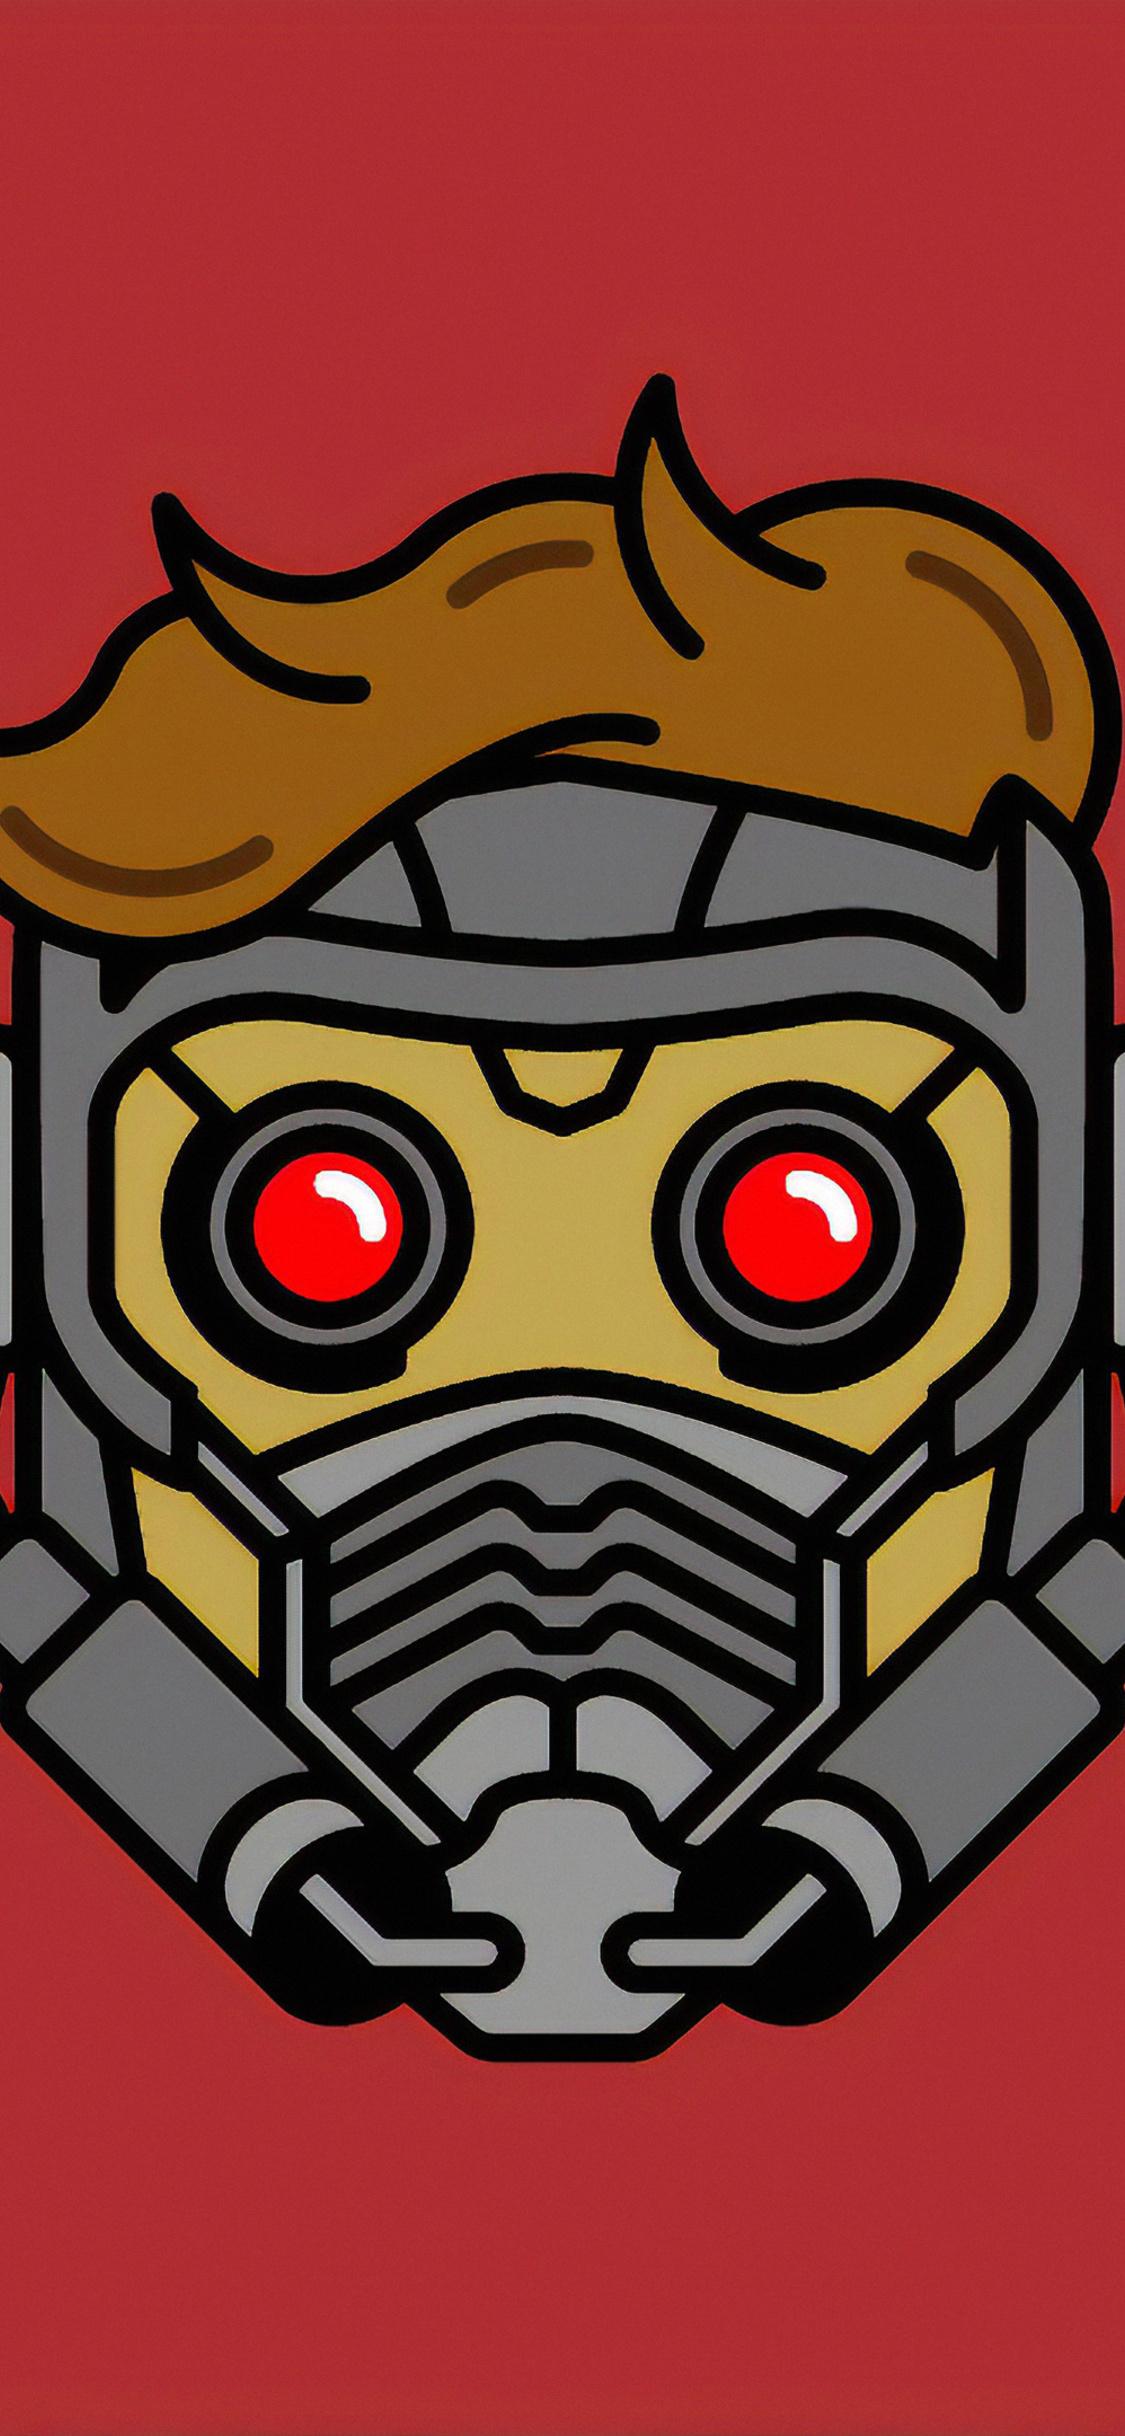 star-lord-mask-minimal-4o.jpg